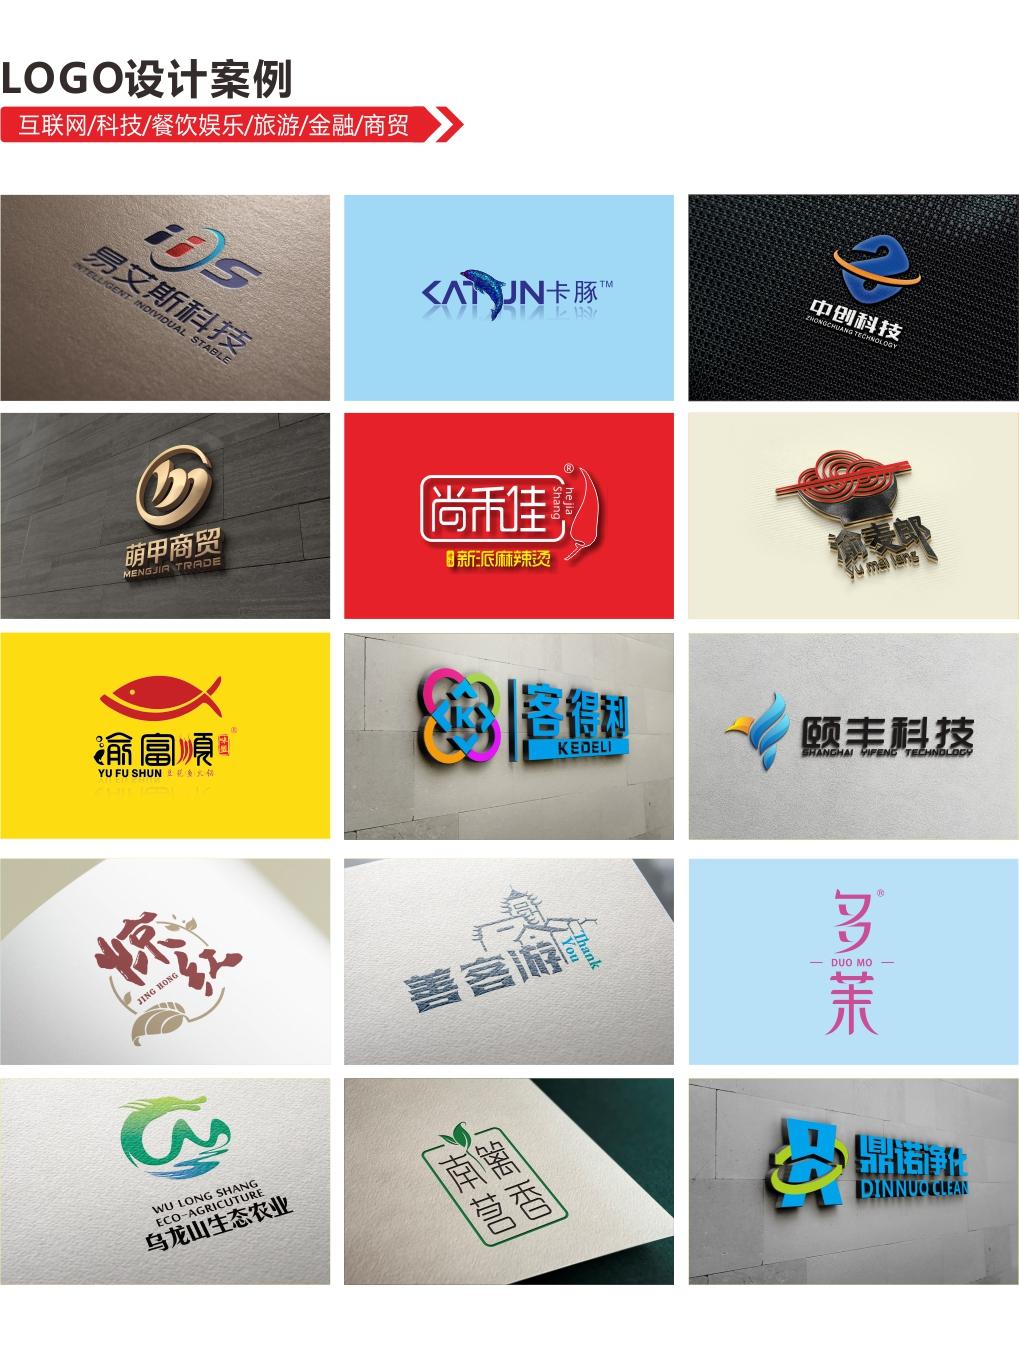 LOGO_logo设计企业公司商标设计品牌LOGO标志设计字体设计3